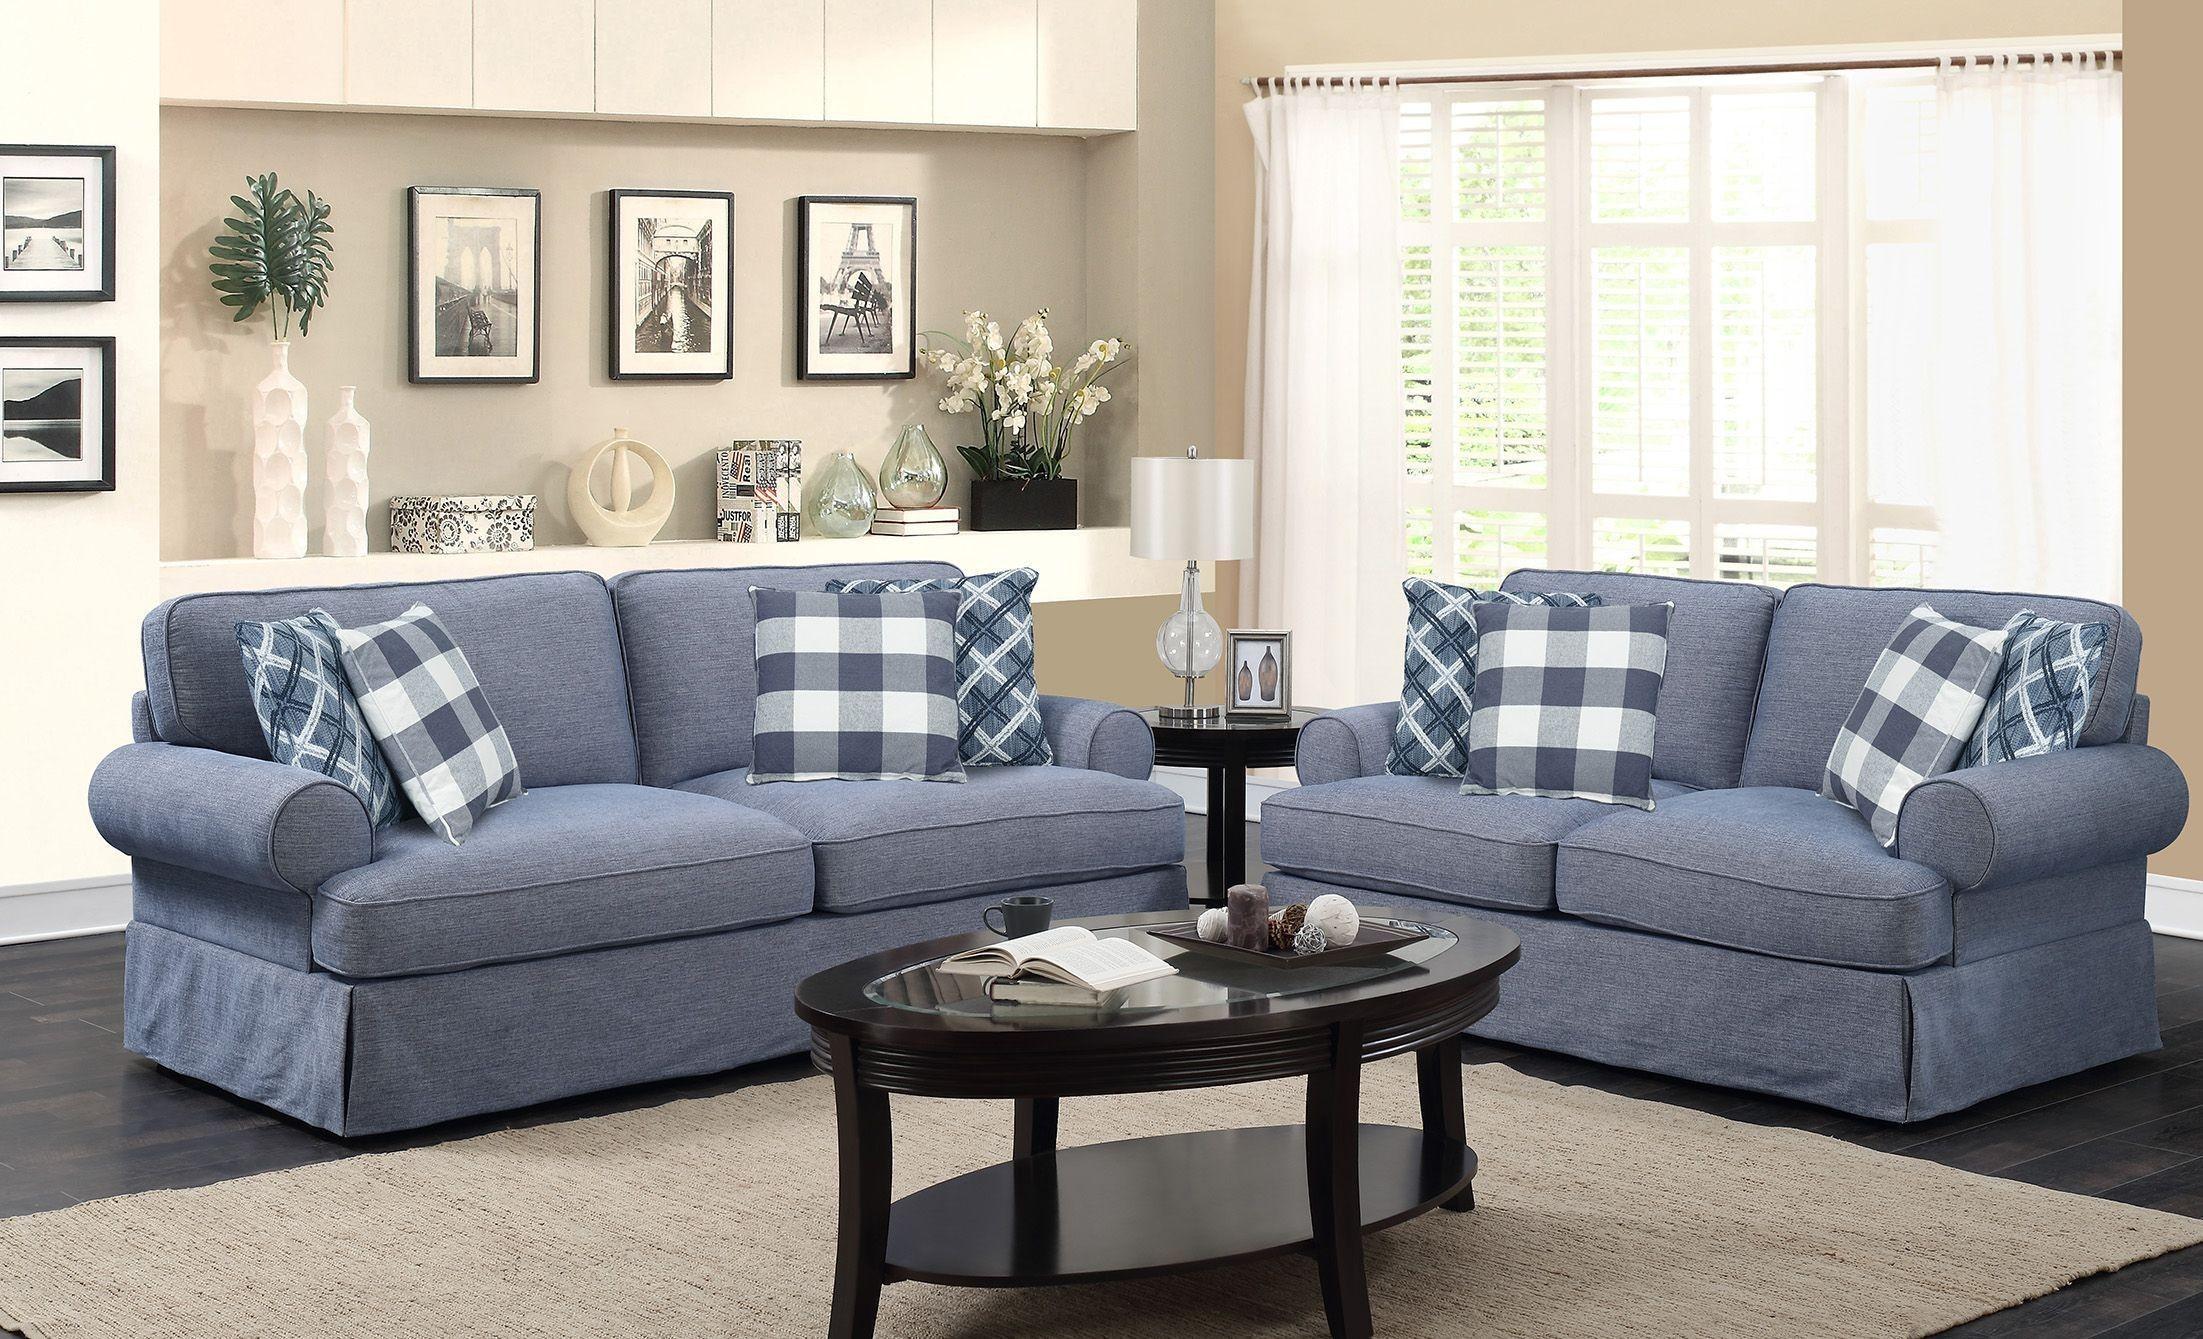 Mountain Retreat Pool Blue Living Room Set, U6001-00-08